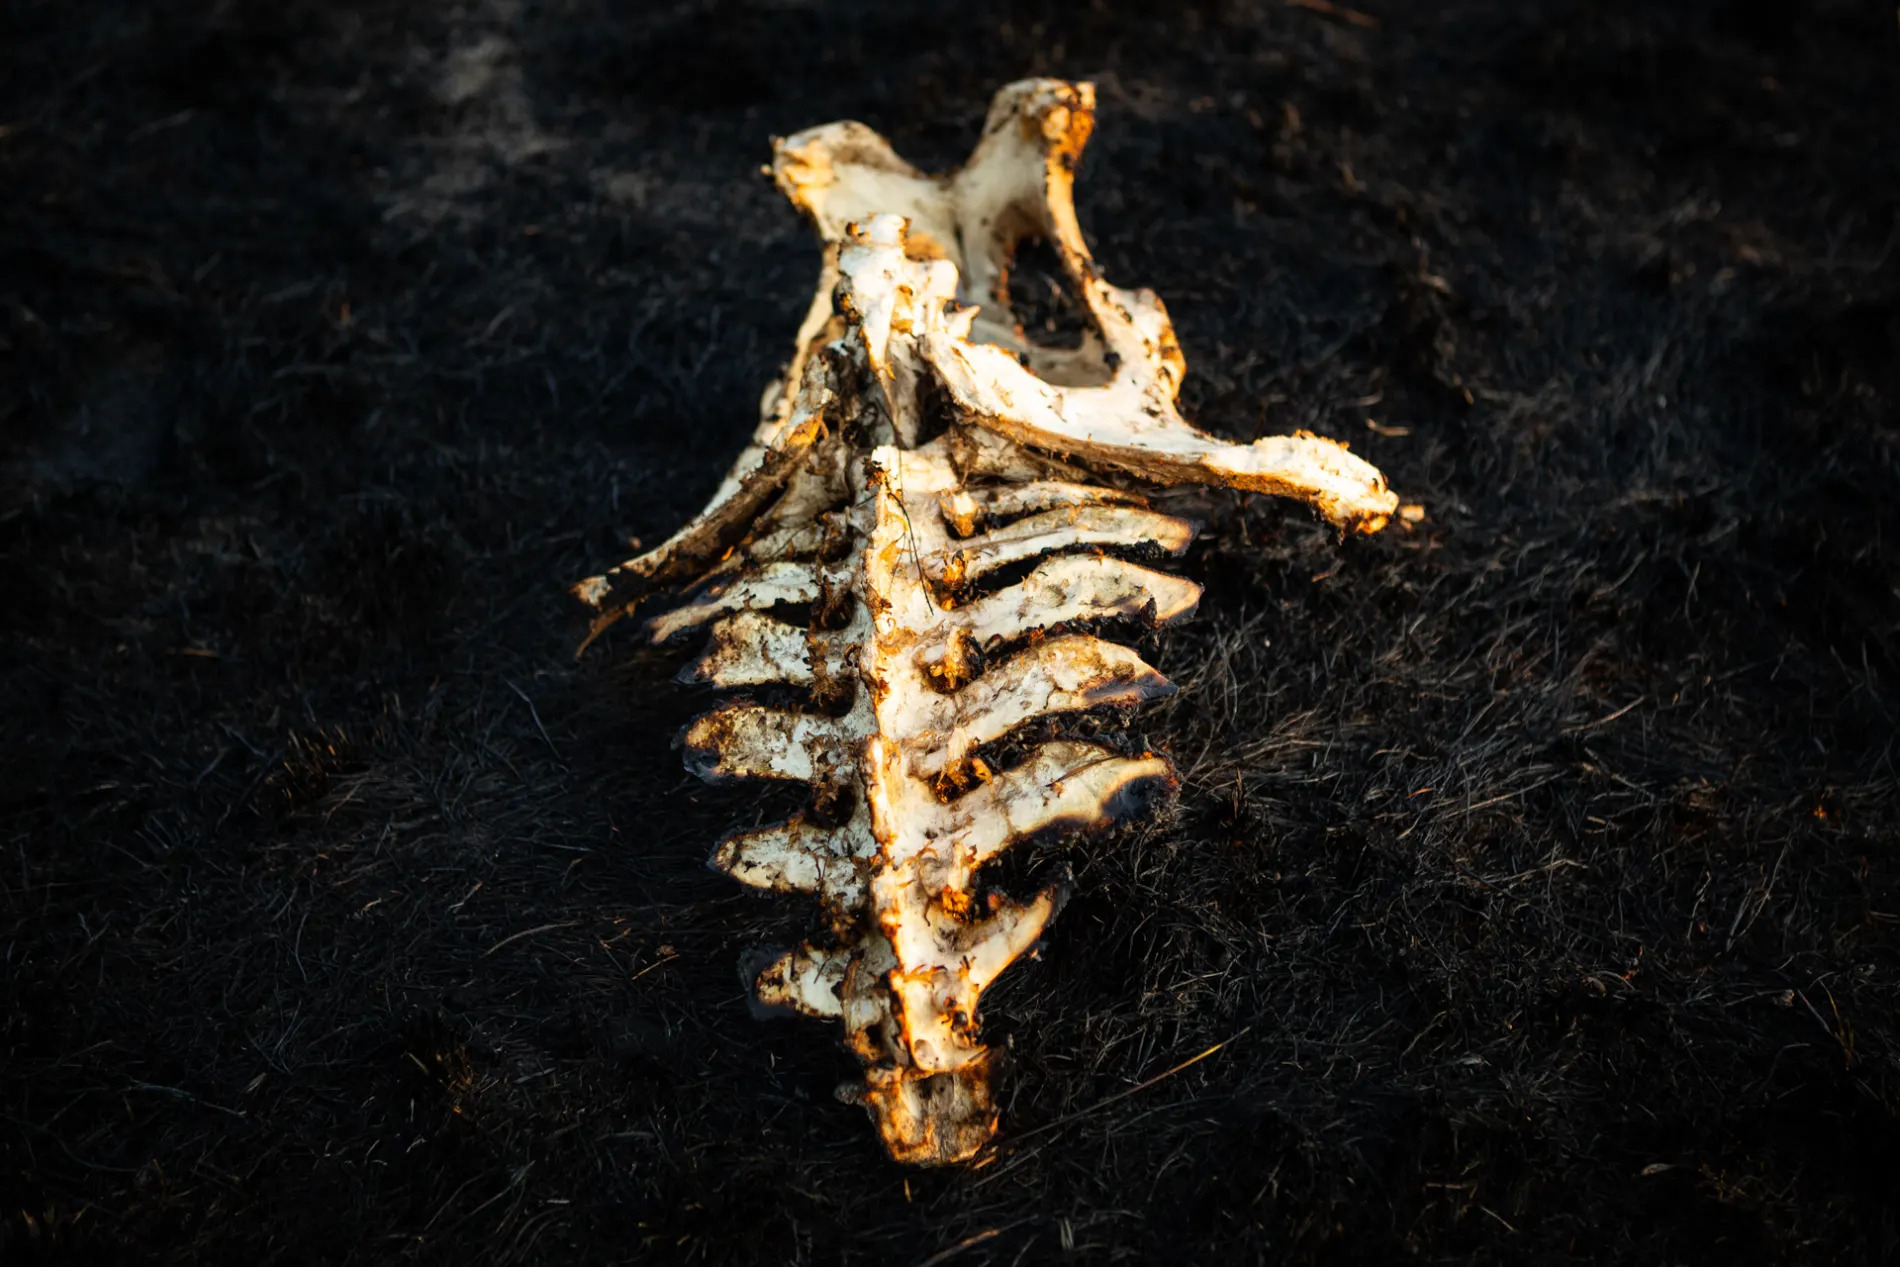 Carcass in fire